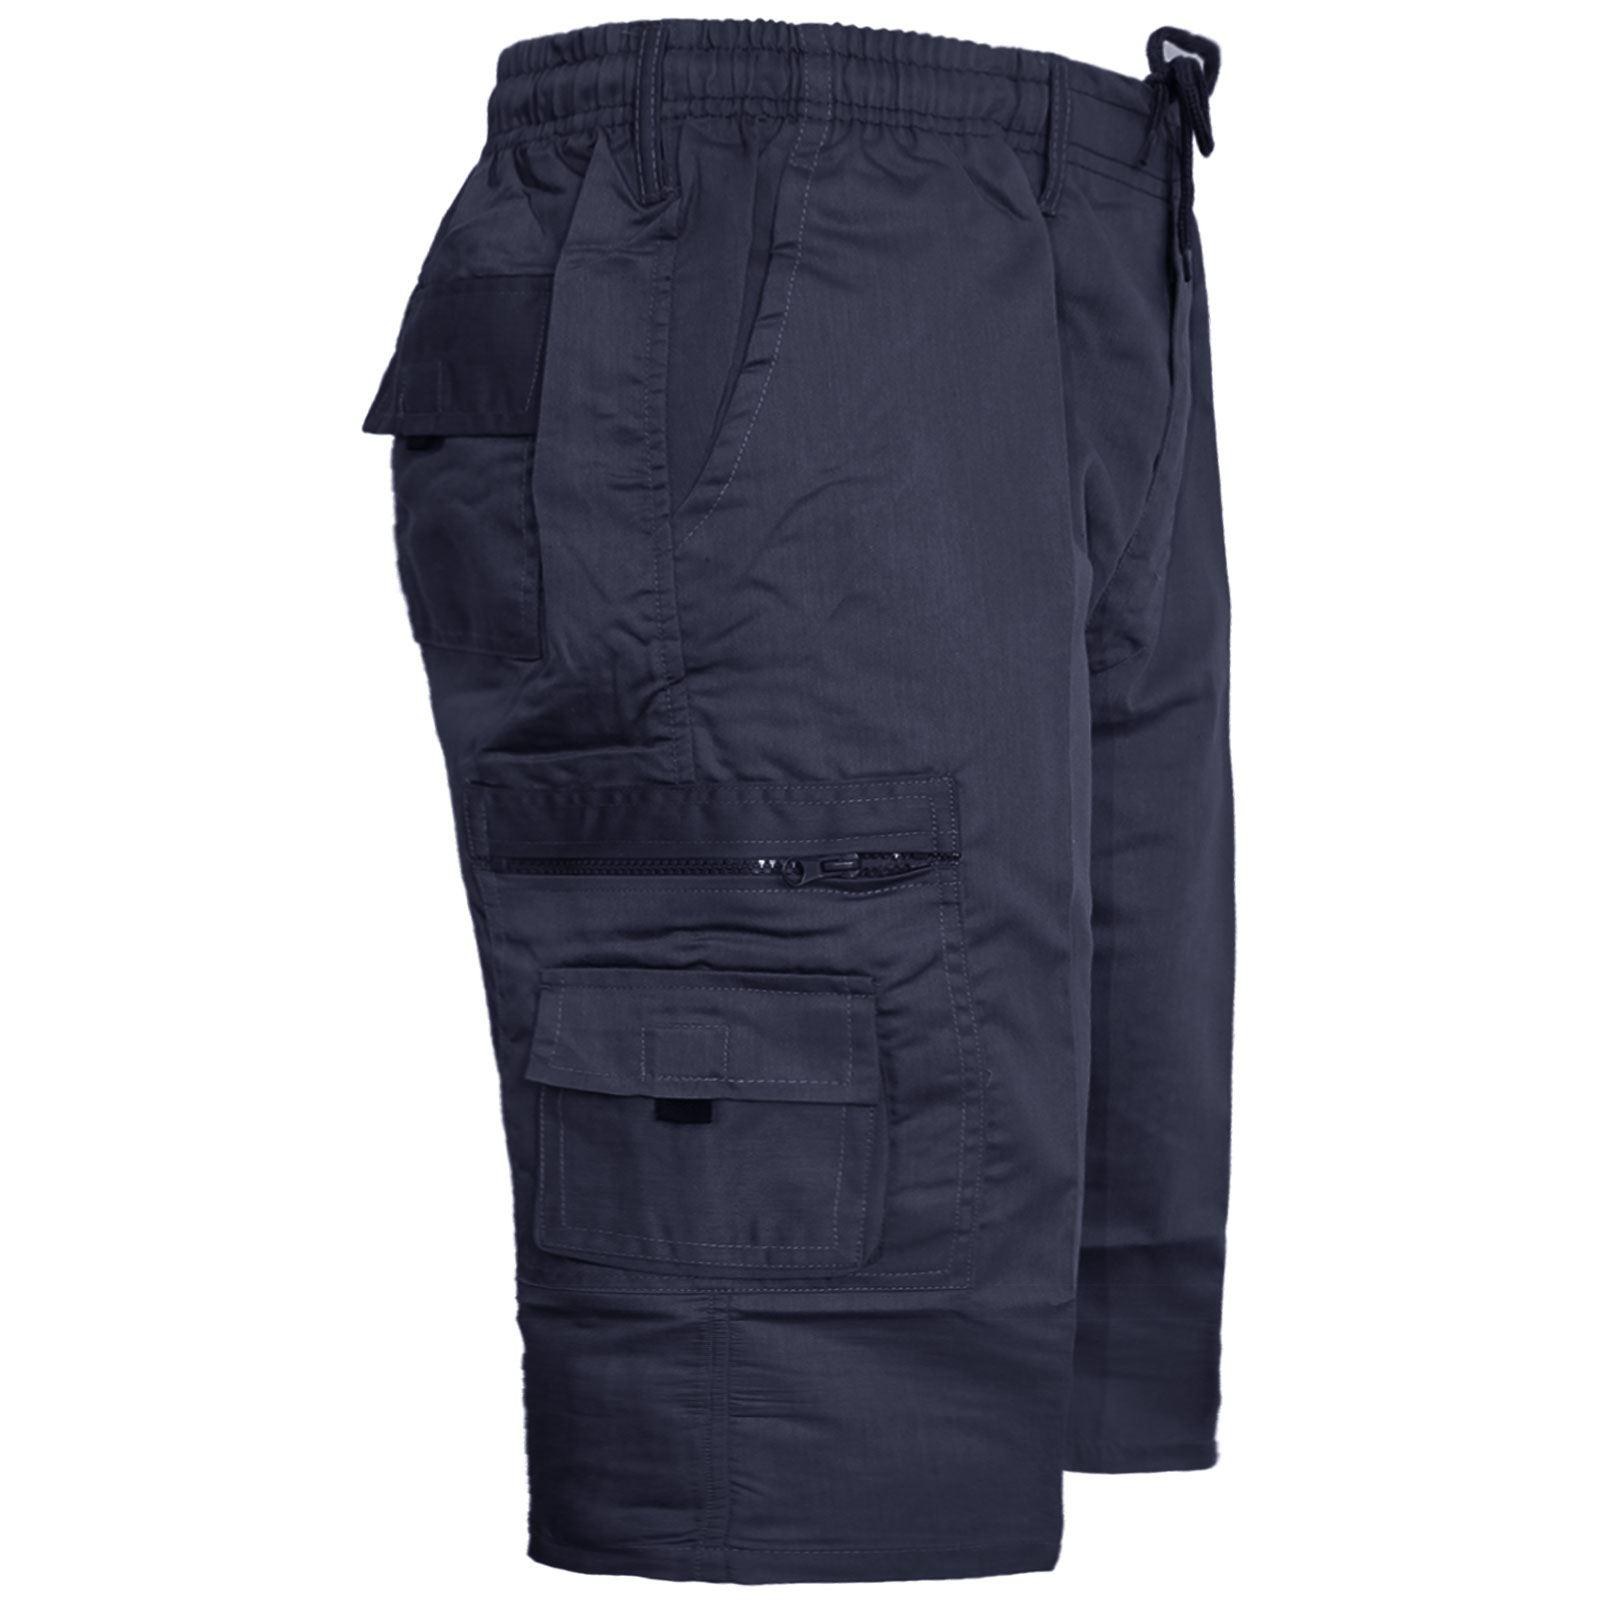 Para-Hombre-Elastico-Casual-Verano-Shorts-Pantalones-cortos-de-carga-Rey-Tamano-Grande-4XL-5XL-6XL miniatura 6